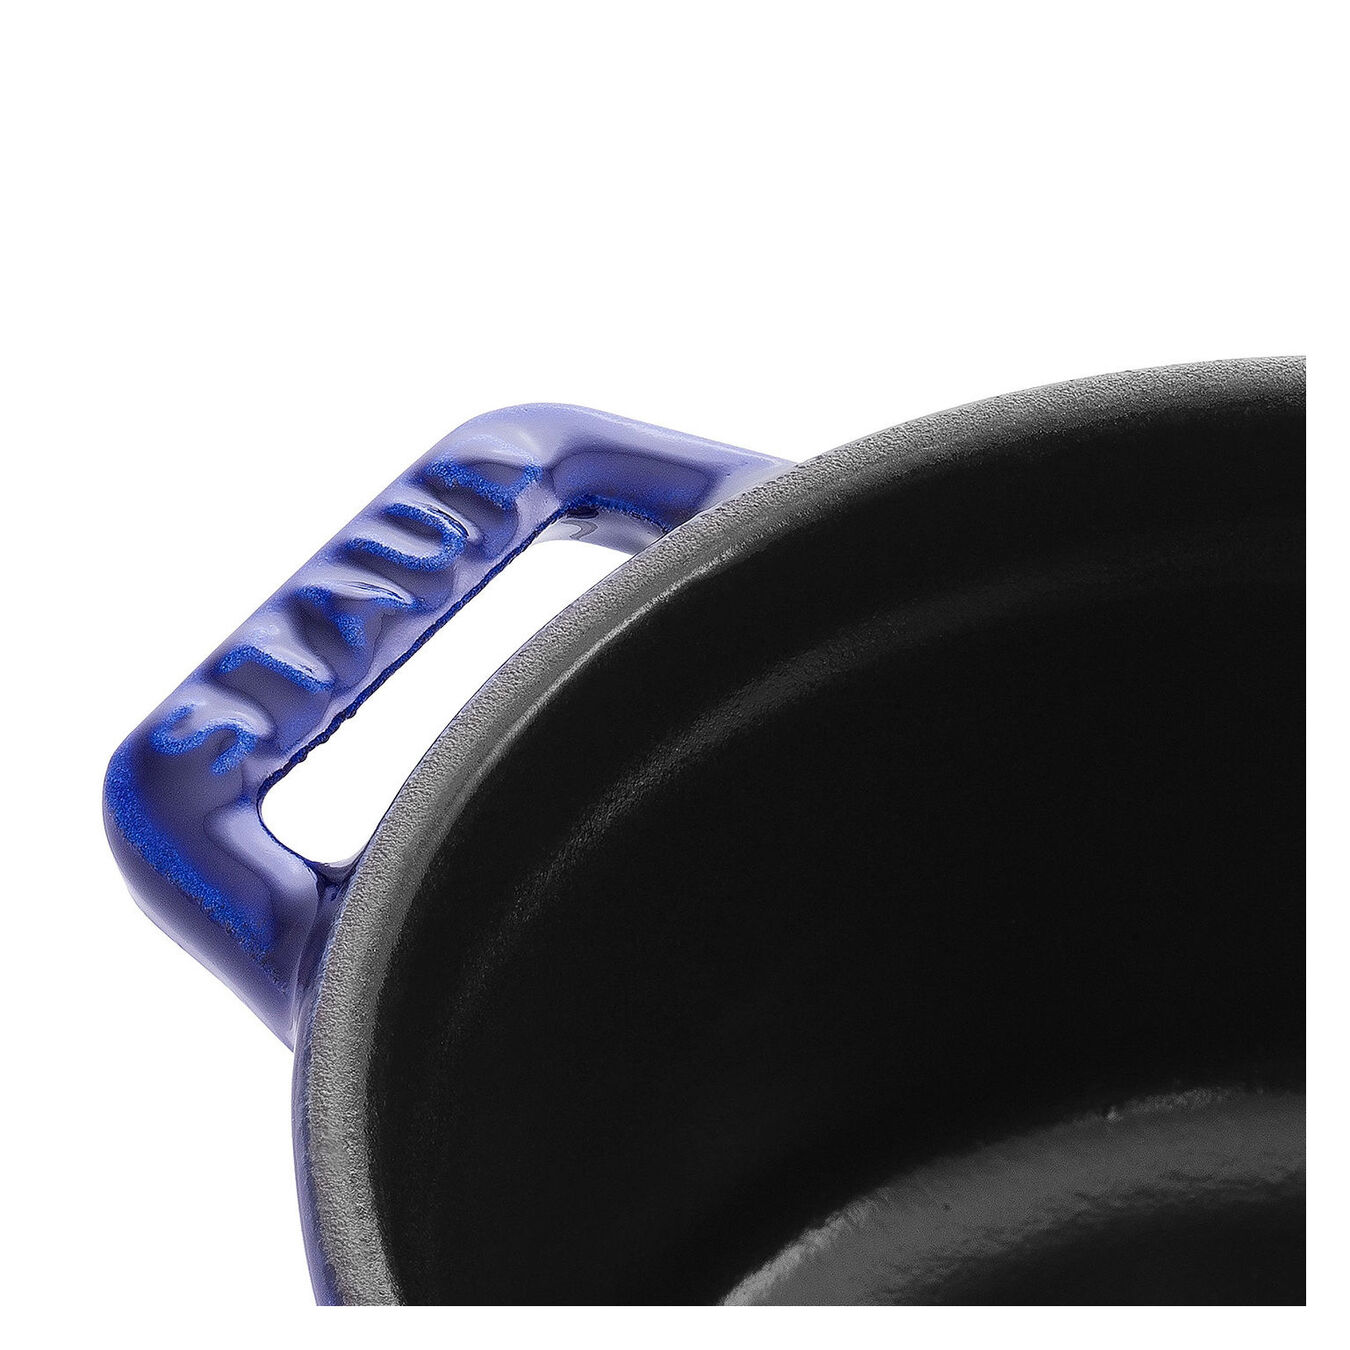 Mini Cocotte 10 cm, Rond(e), Bleu intense, Fonte,,large 2